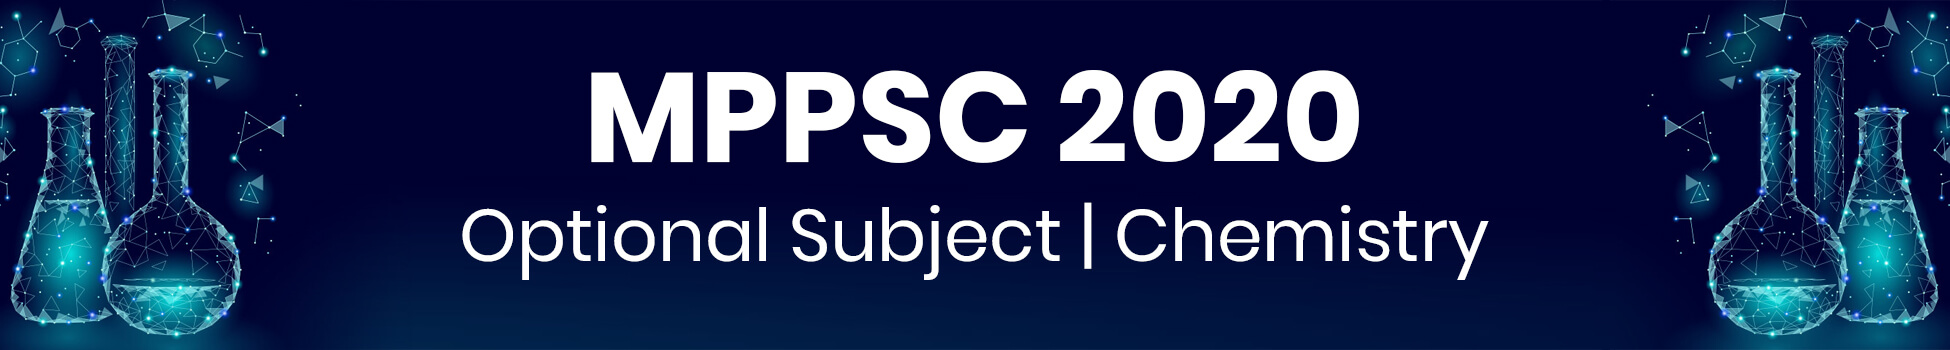 MPPSC 2020 - Optional Subject | Chemistry